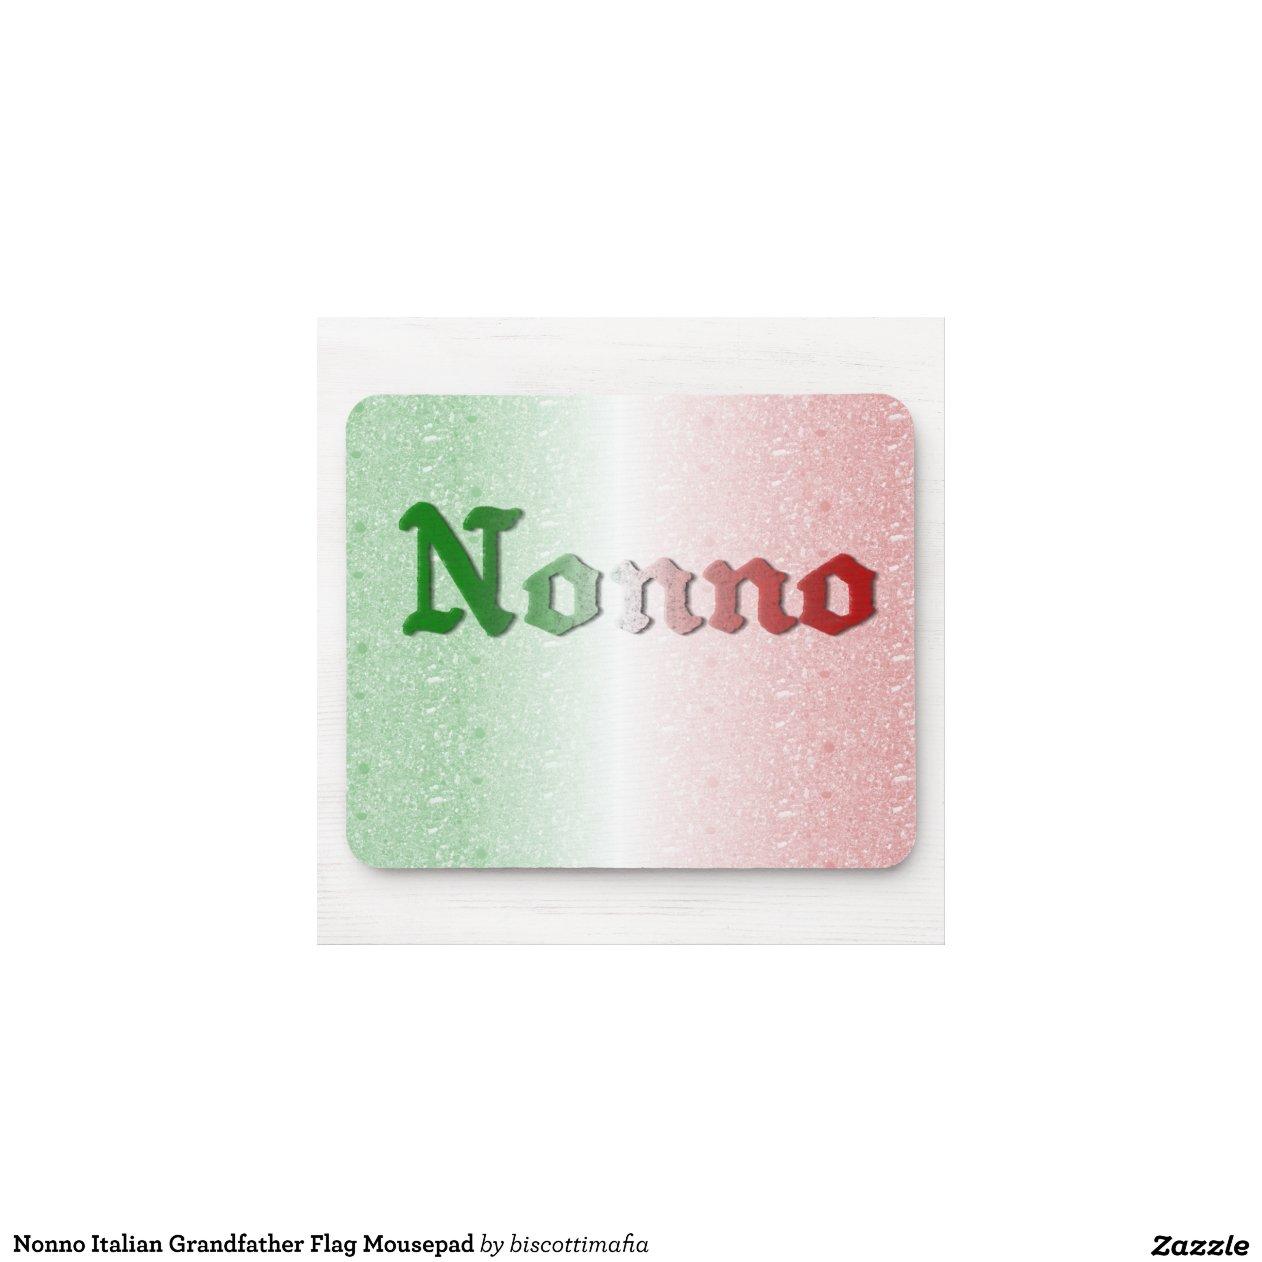 In Italian, the way you say